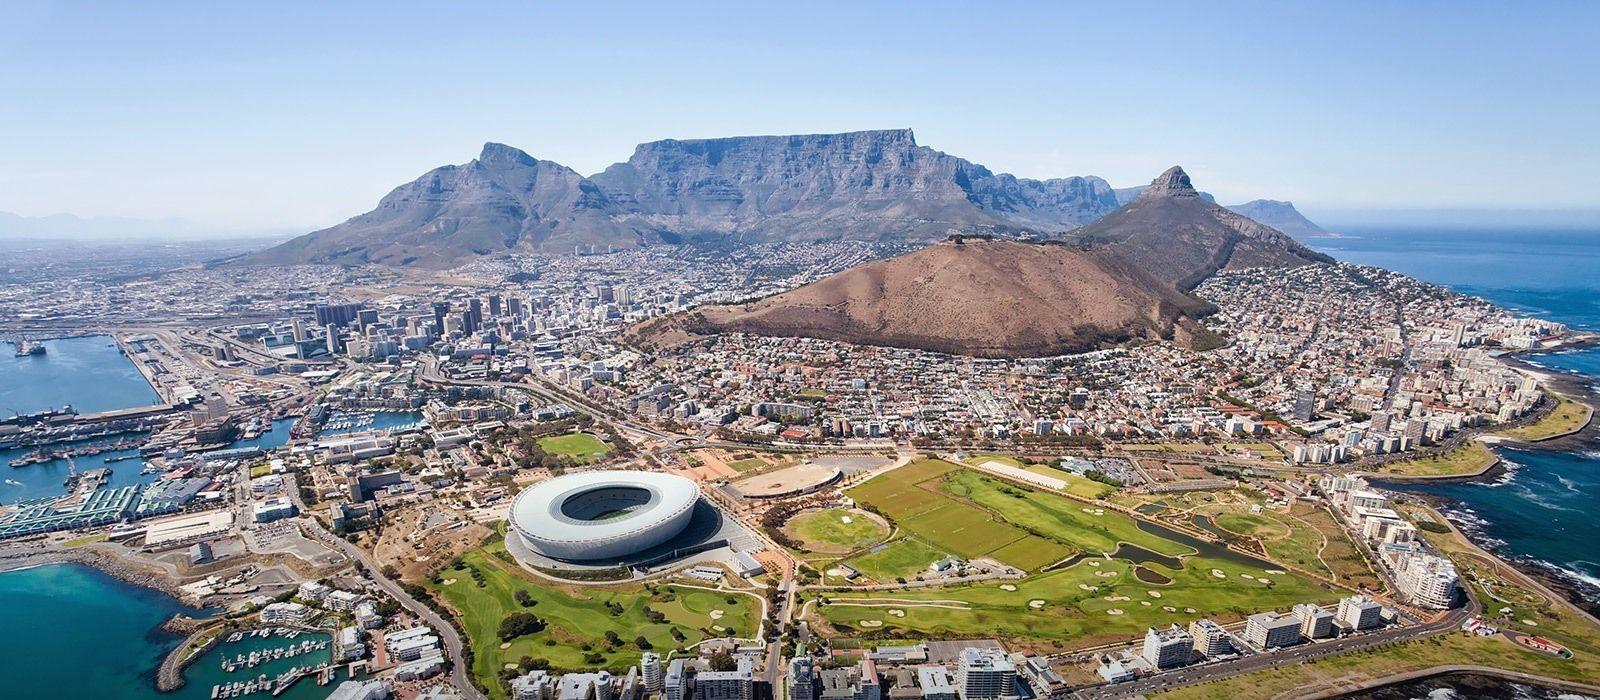 Südafrika & Sambia: Kapstadt, Krüger und Victoriafälle Urlaub 1